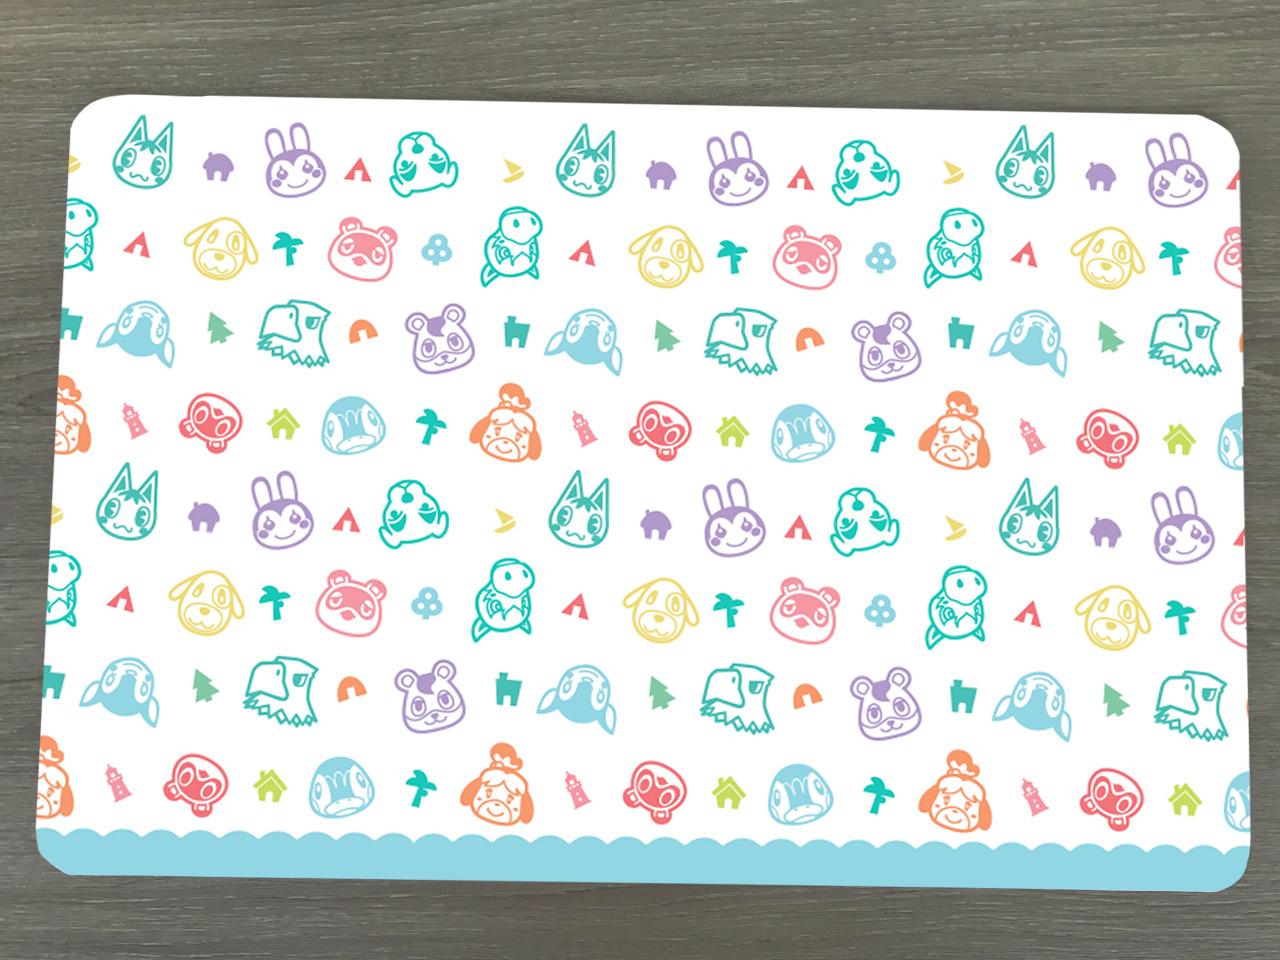 Bureau onderlegger met een Animal Crossing patroon